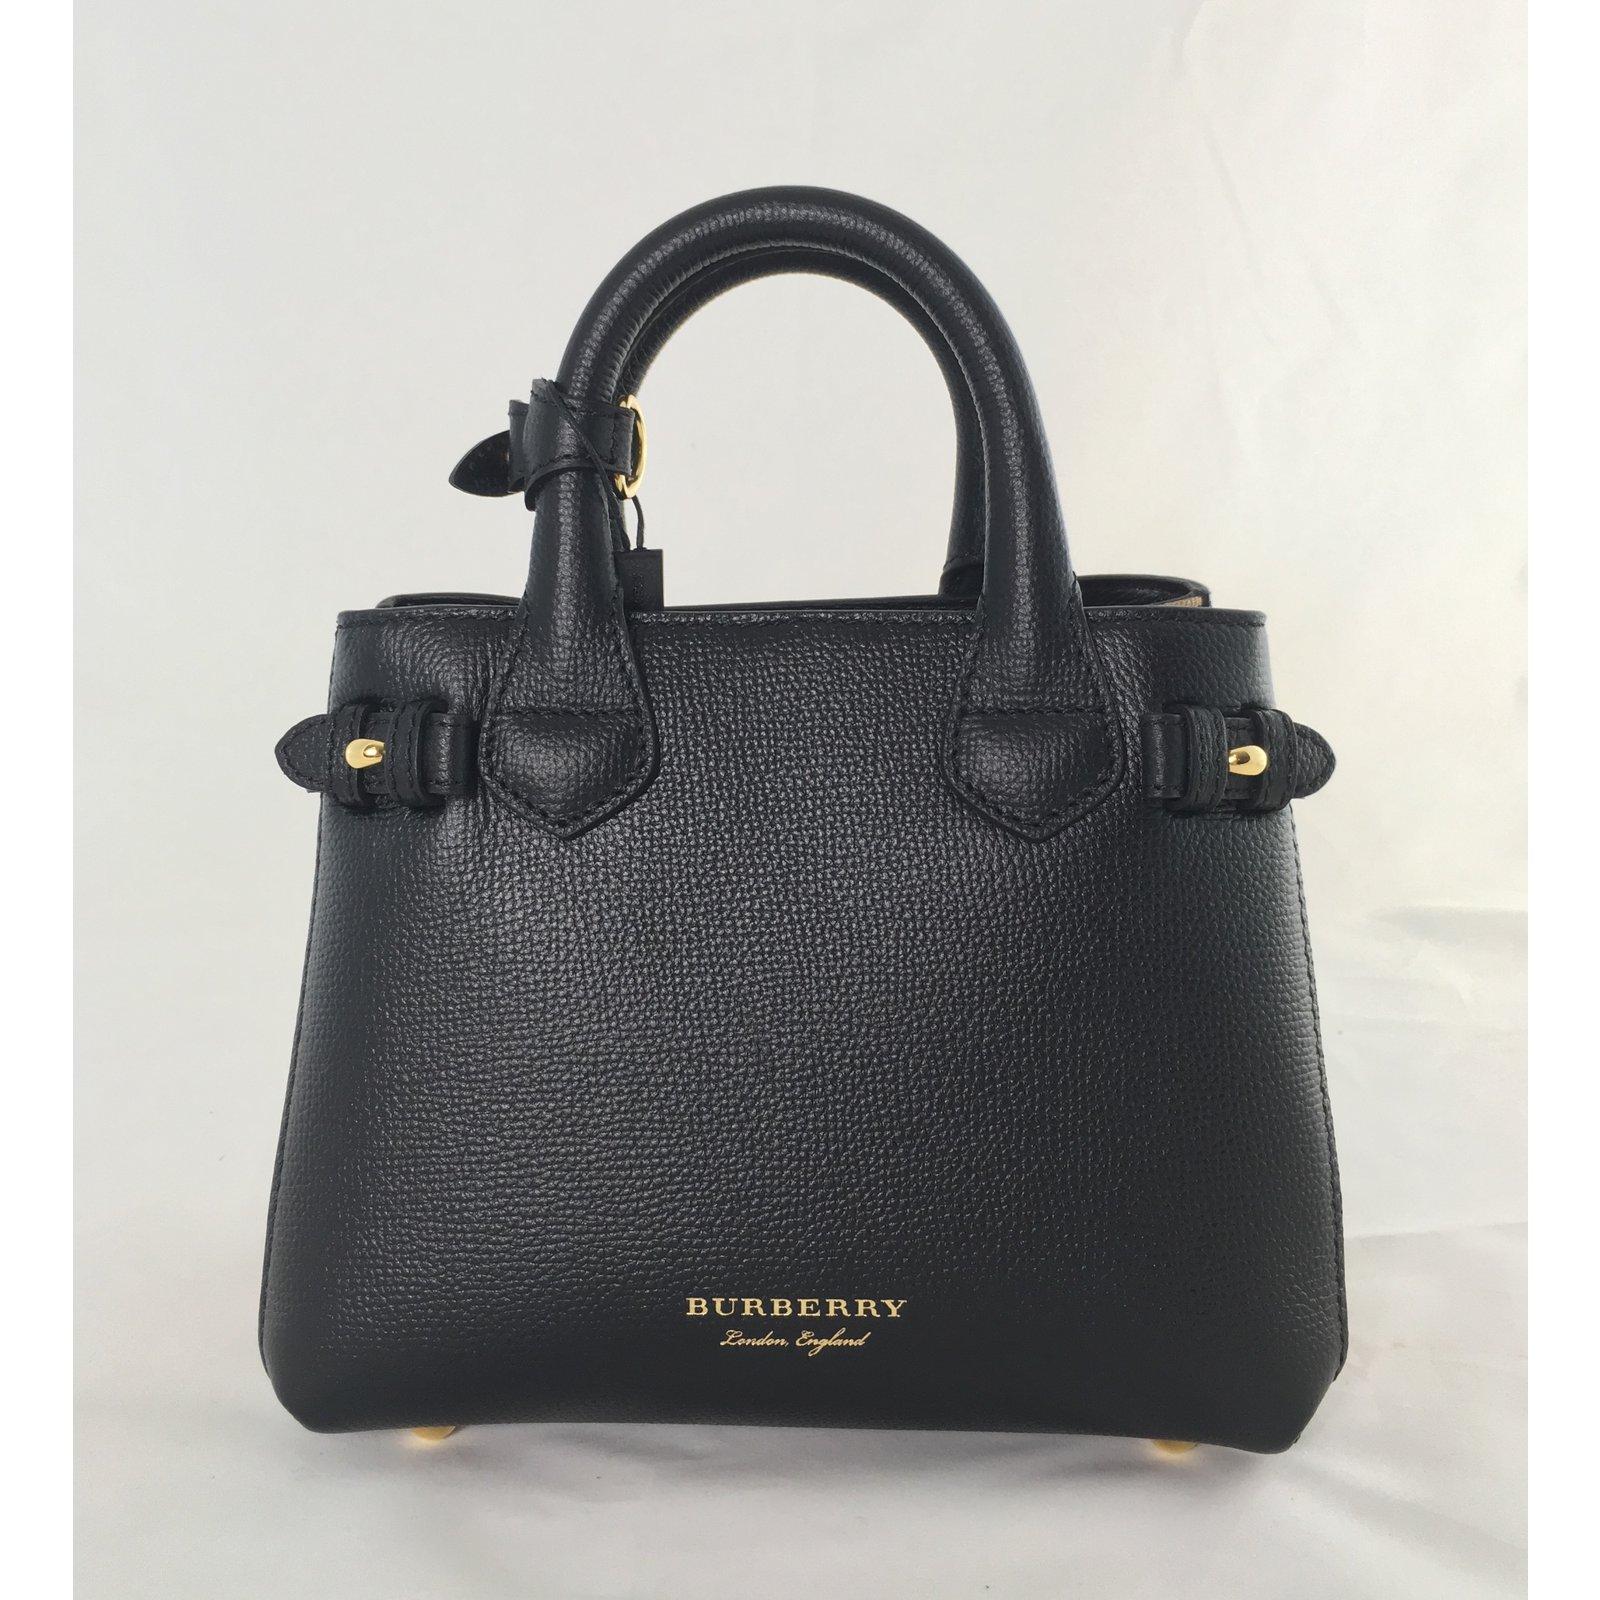 Burberry Baby Banner Handbags Leather Black ref.75108 - Joli Closet 9f8b11701d